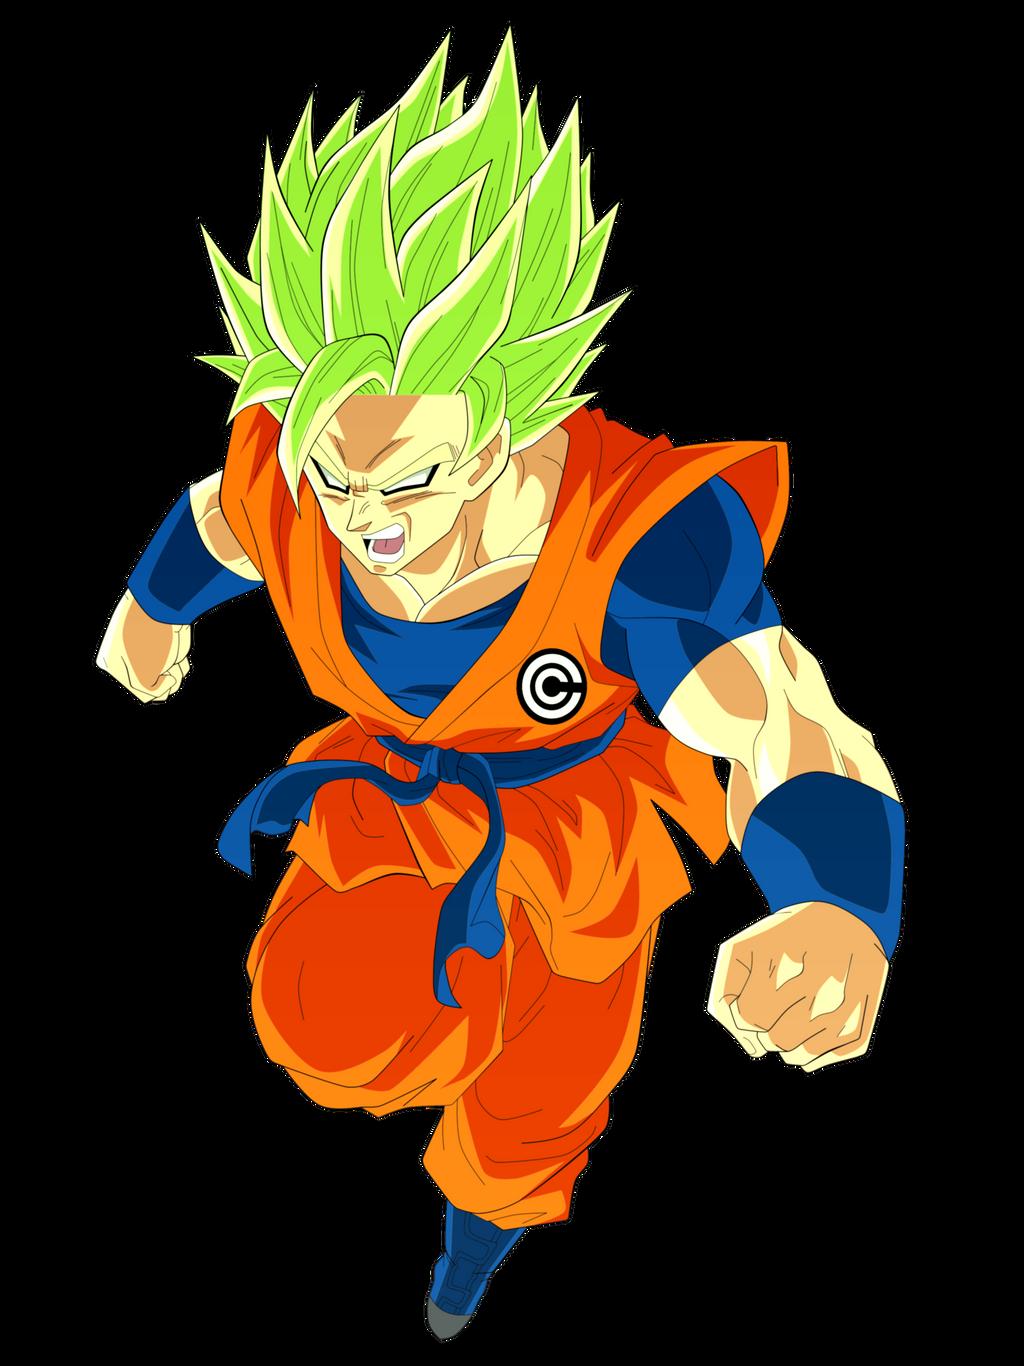 Super Saiyan 2 Rampage Son Goku By Everlastingdarkness5 On